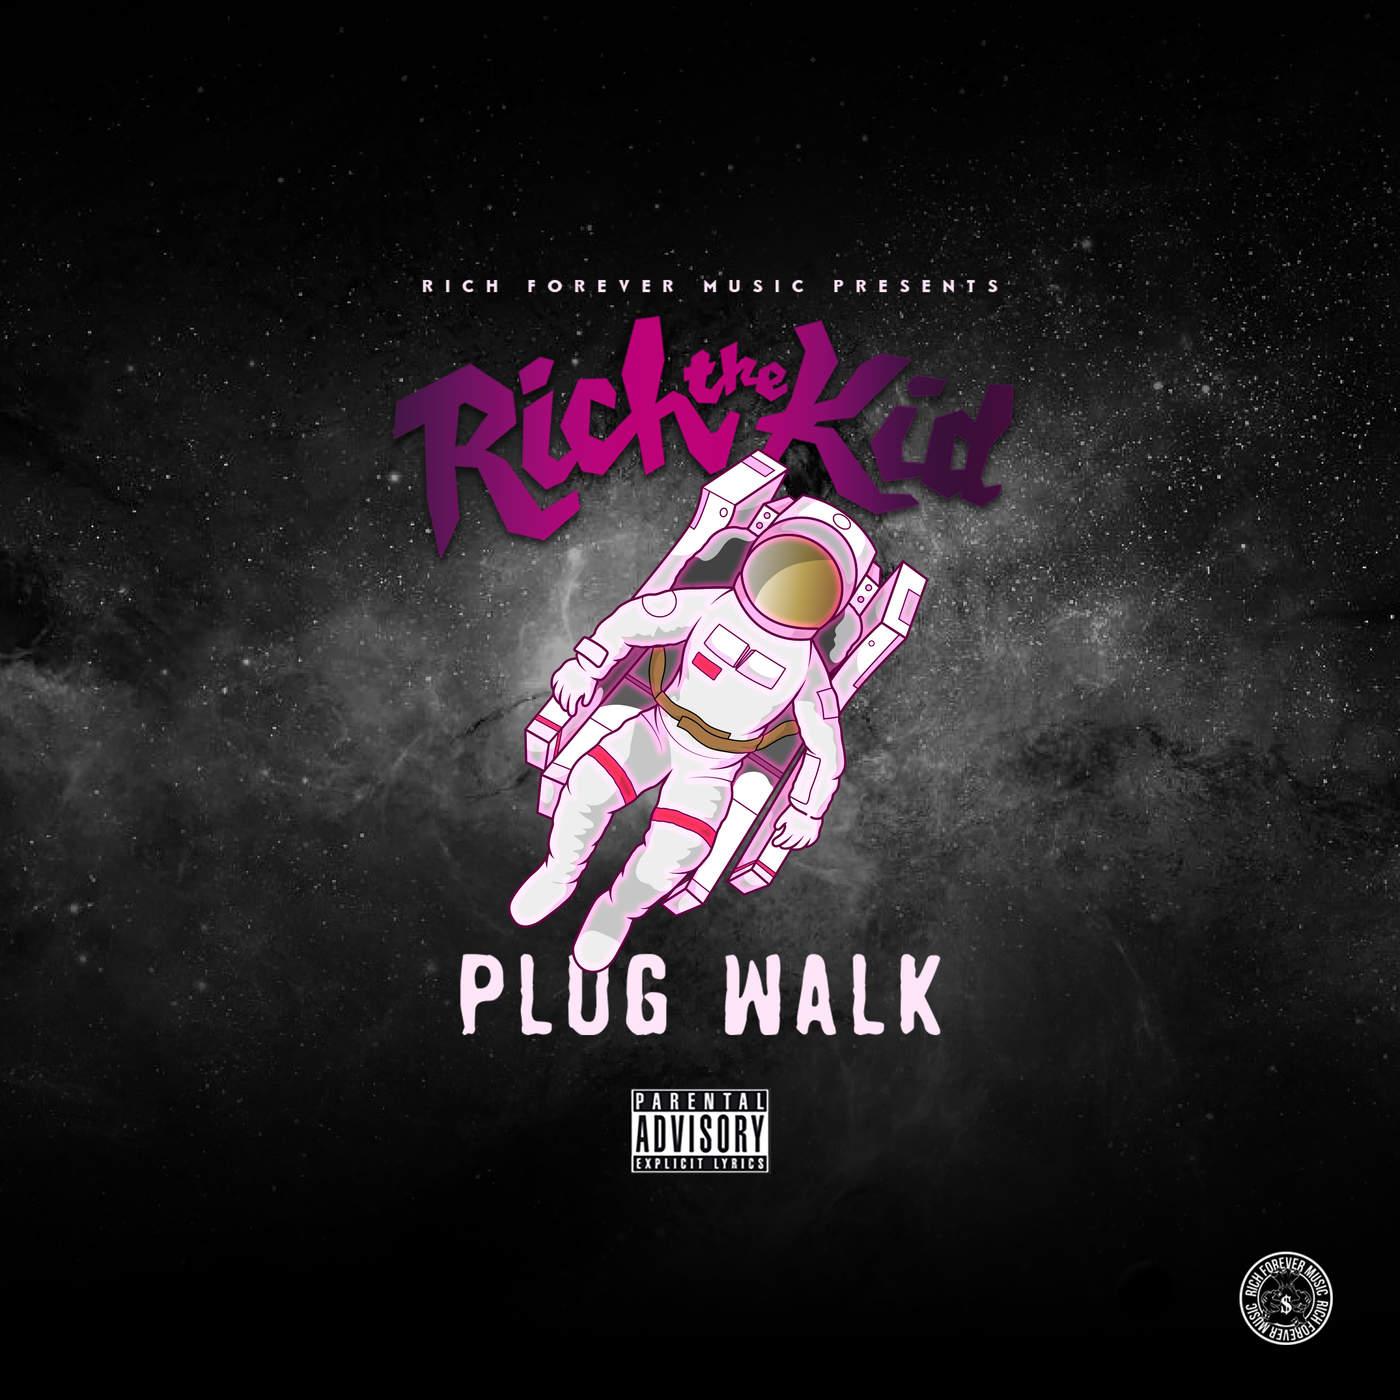 Rich The Kid - Plug Walk - Single Cover